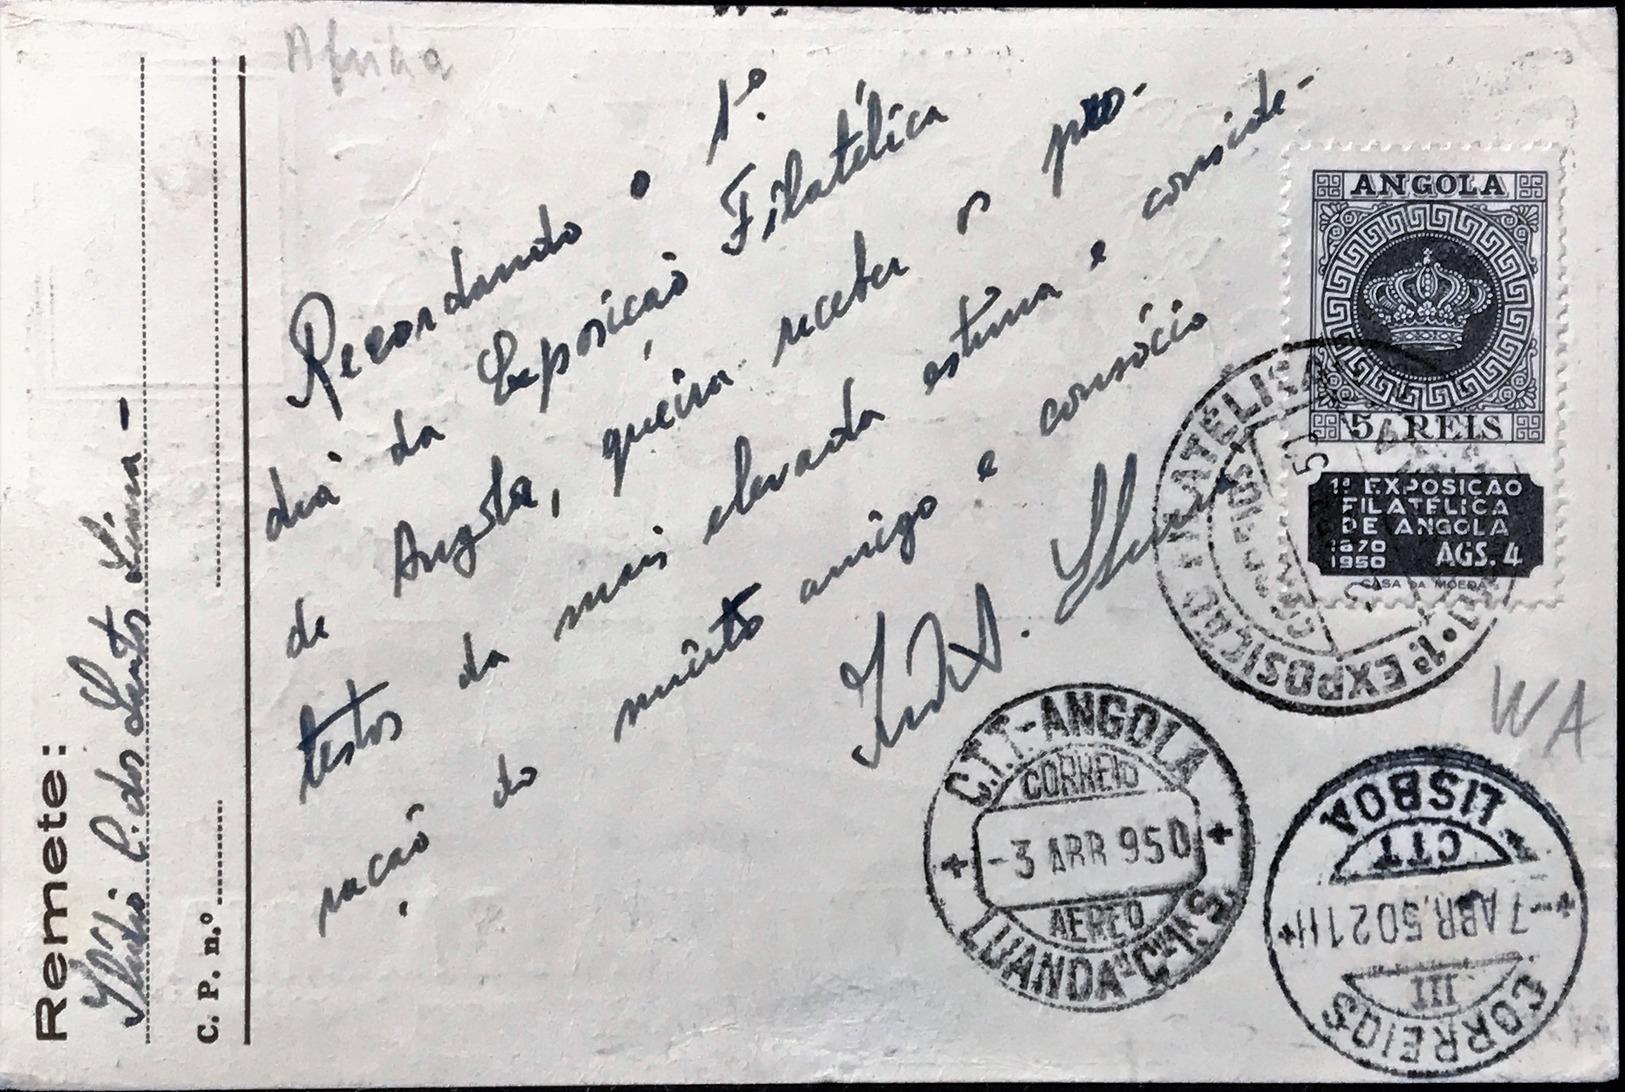 Angola Carte Postal - 1.Exposicao Filatélica De Angola - Luanda 1950 - Chile !! - Angola